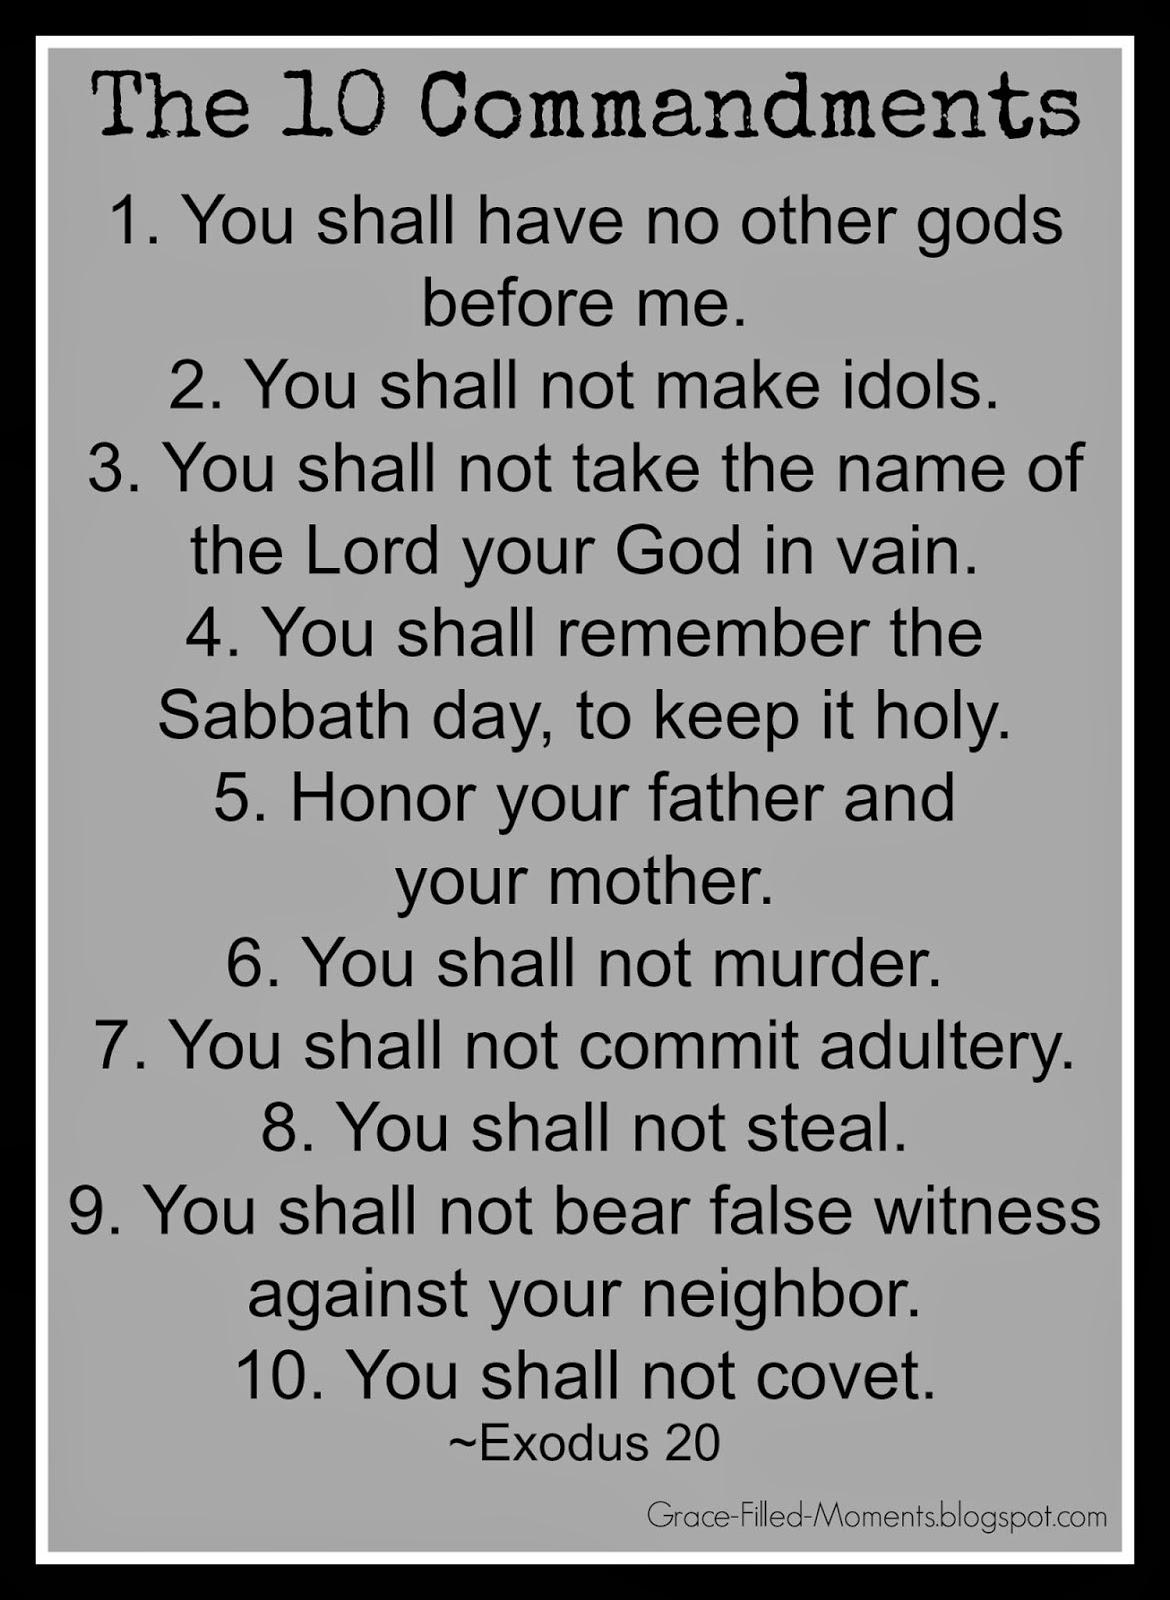 Grace filled moments do the 10 commandments still matter blogging